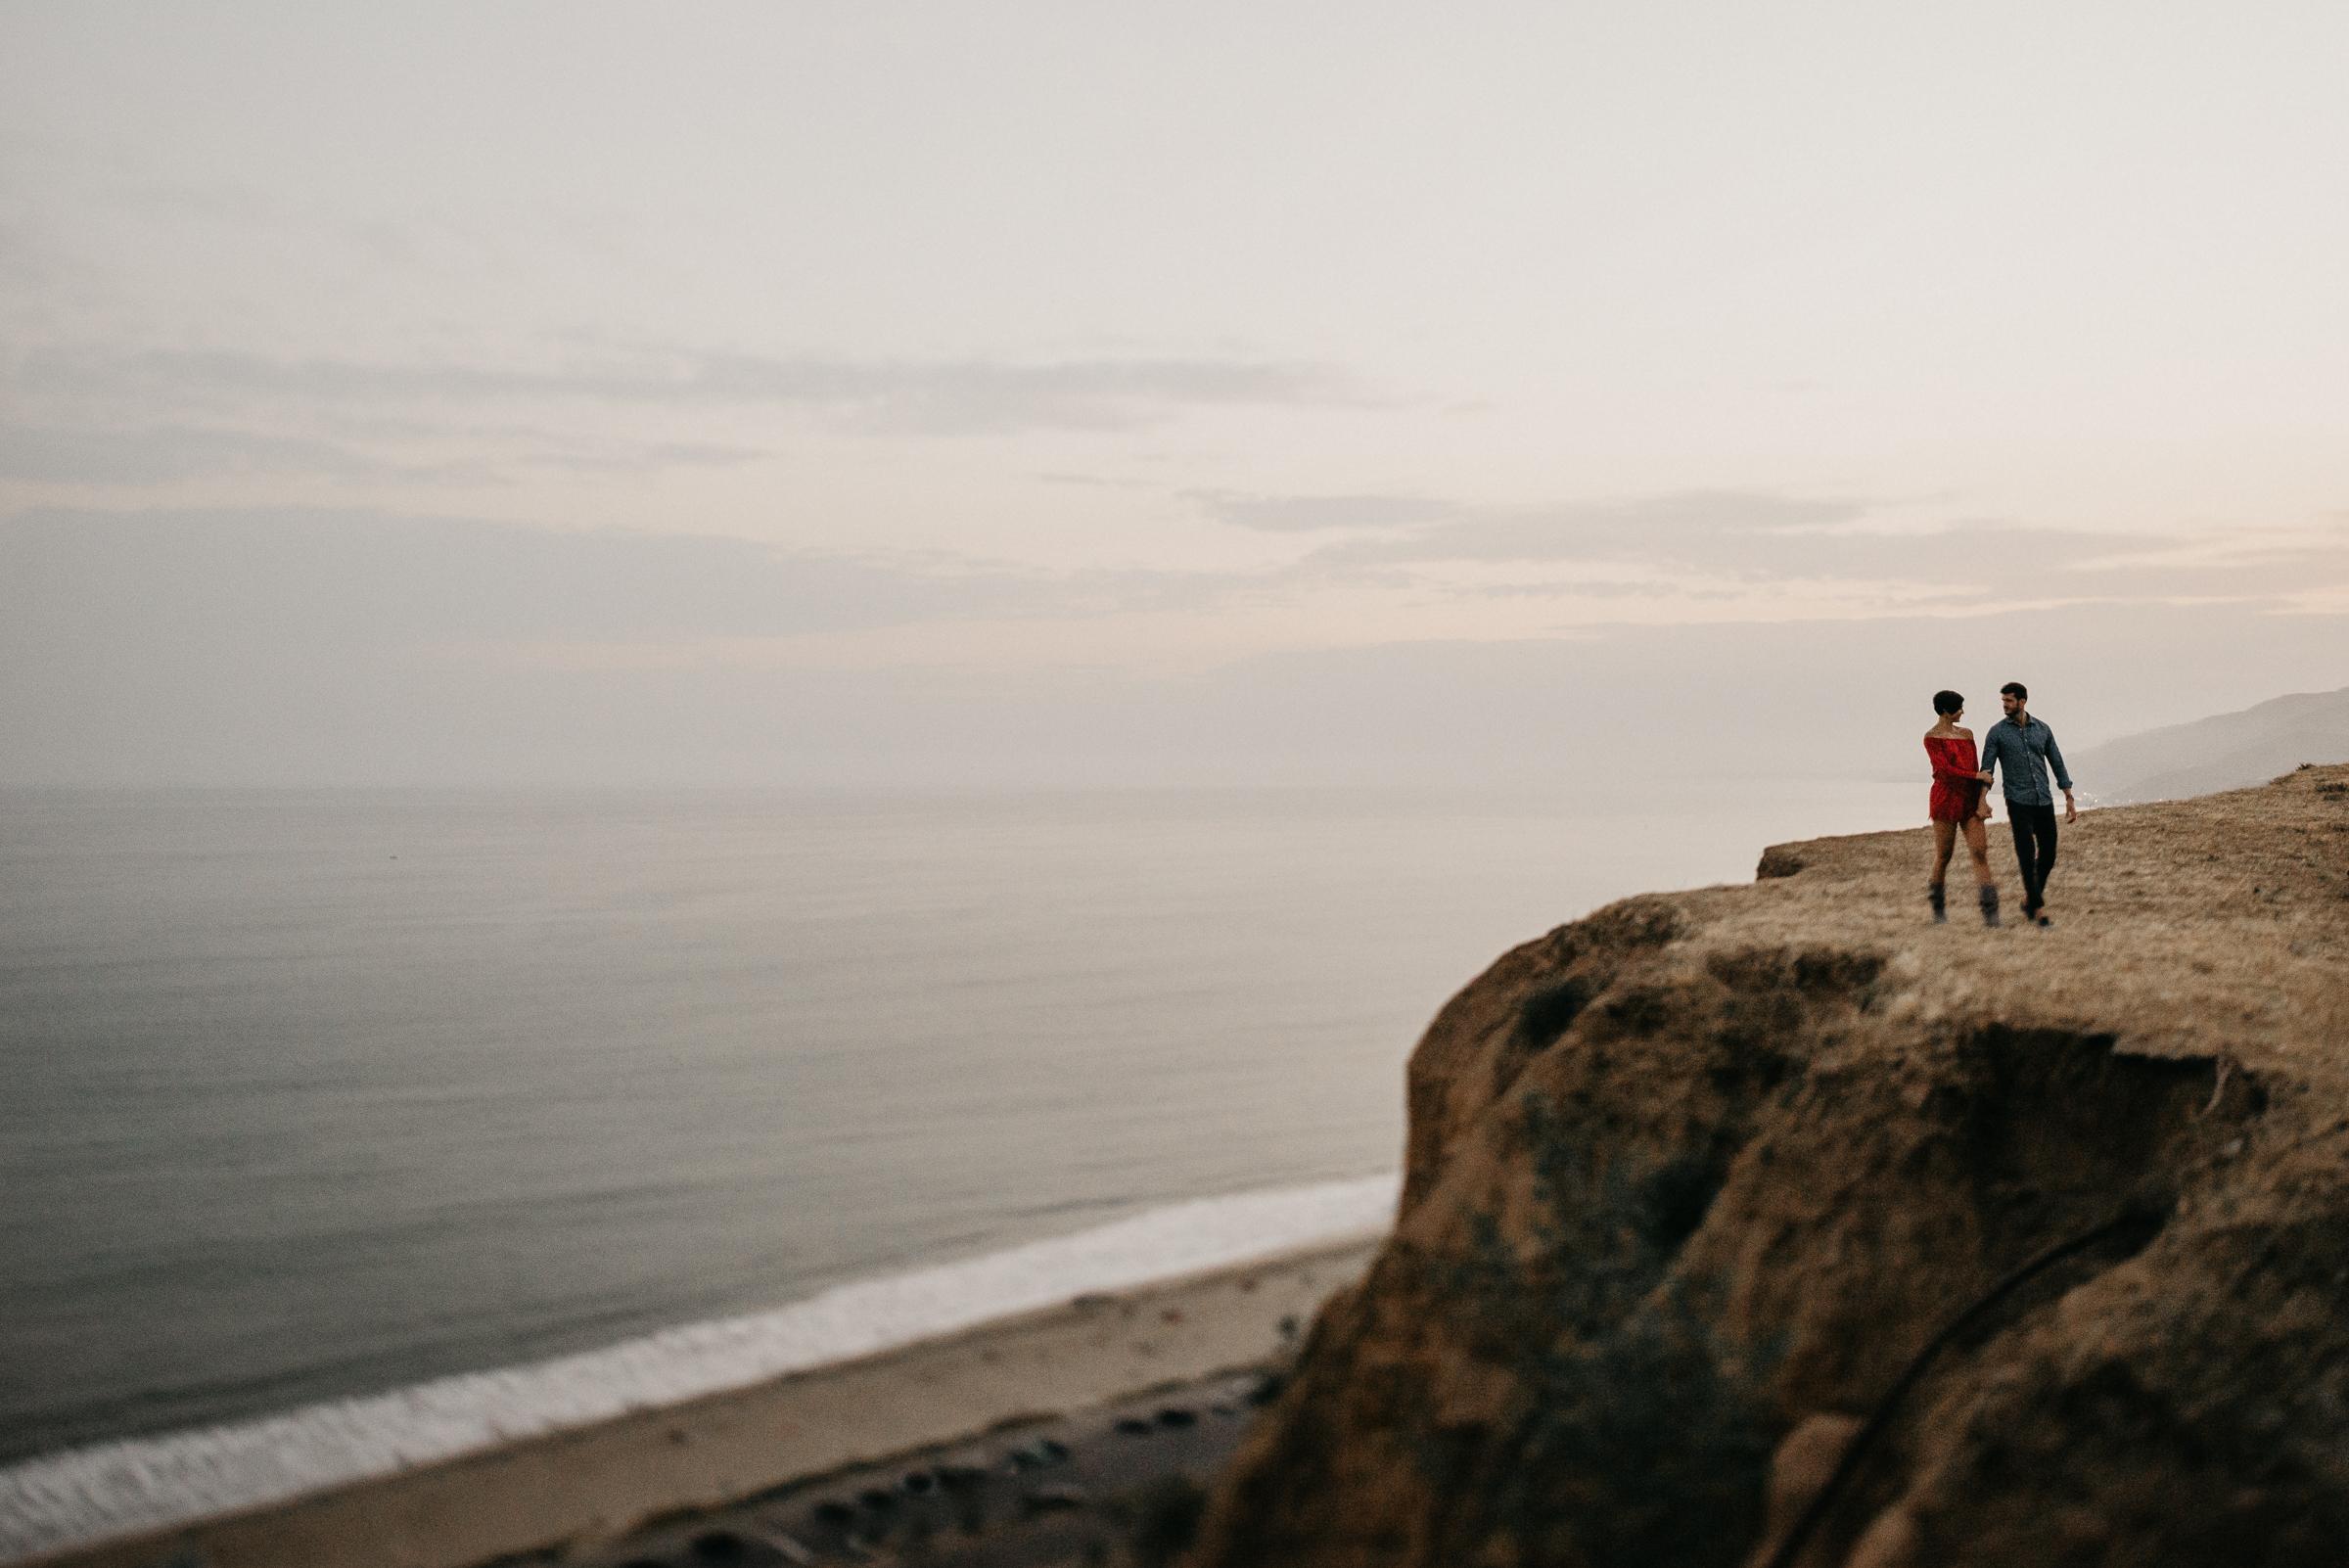 Isaiah + Taylor Photography - Santa Monica Engagement Session, Los Angeles Wedding Photographer-069.jpg